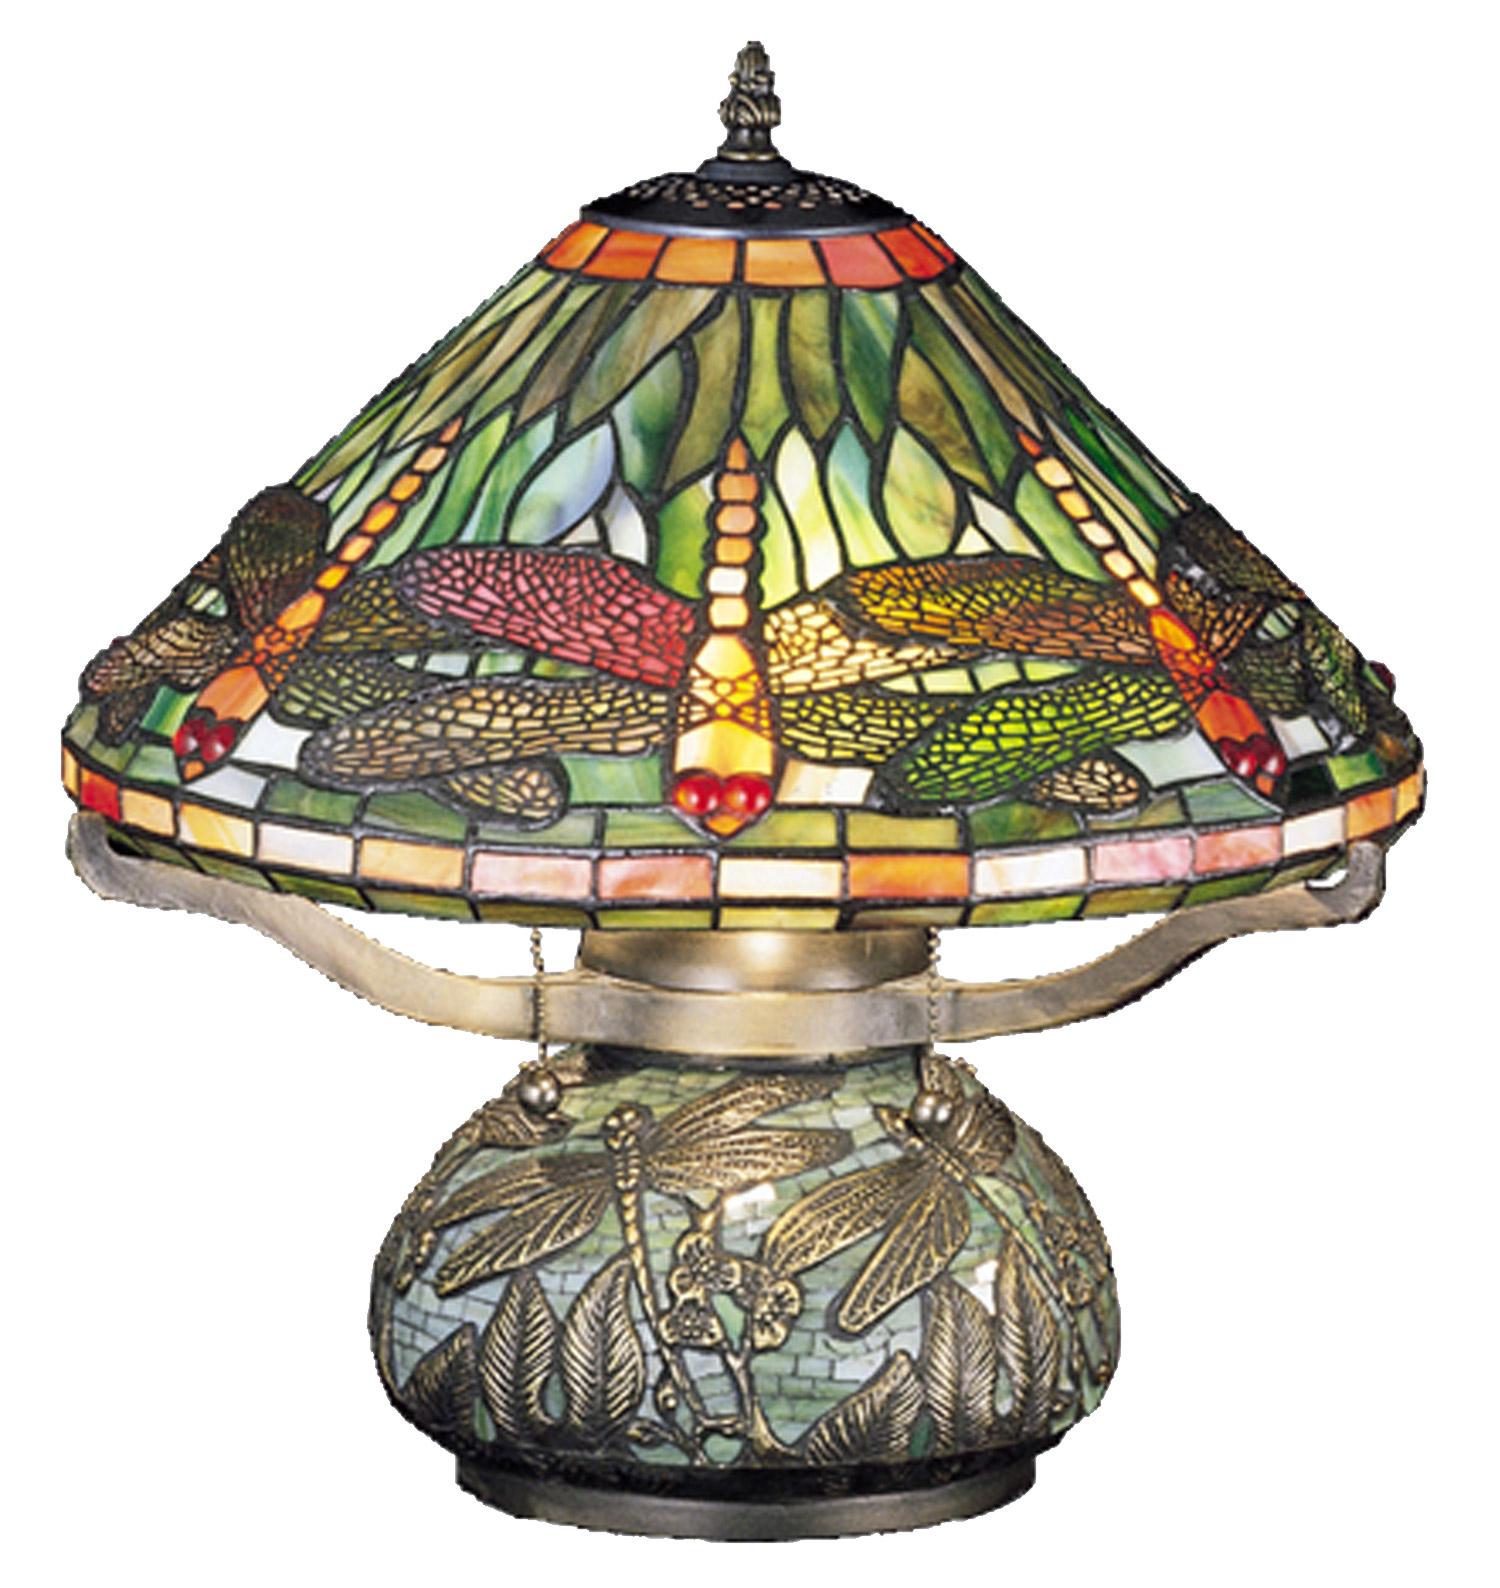 Louis C. Tiffany Dragonfly Lamp (414) - YouTube